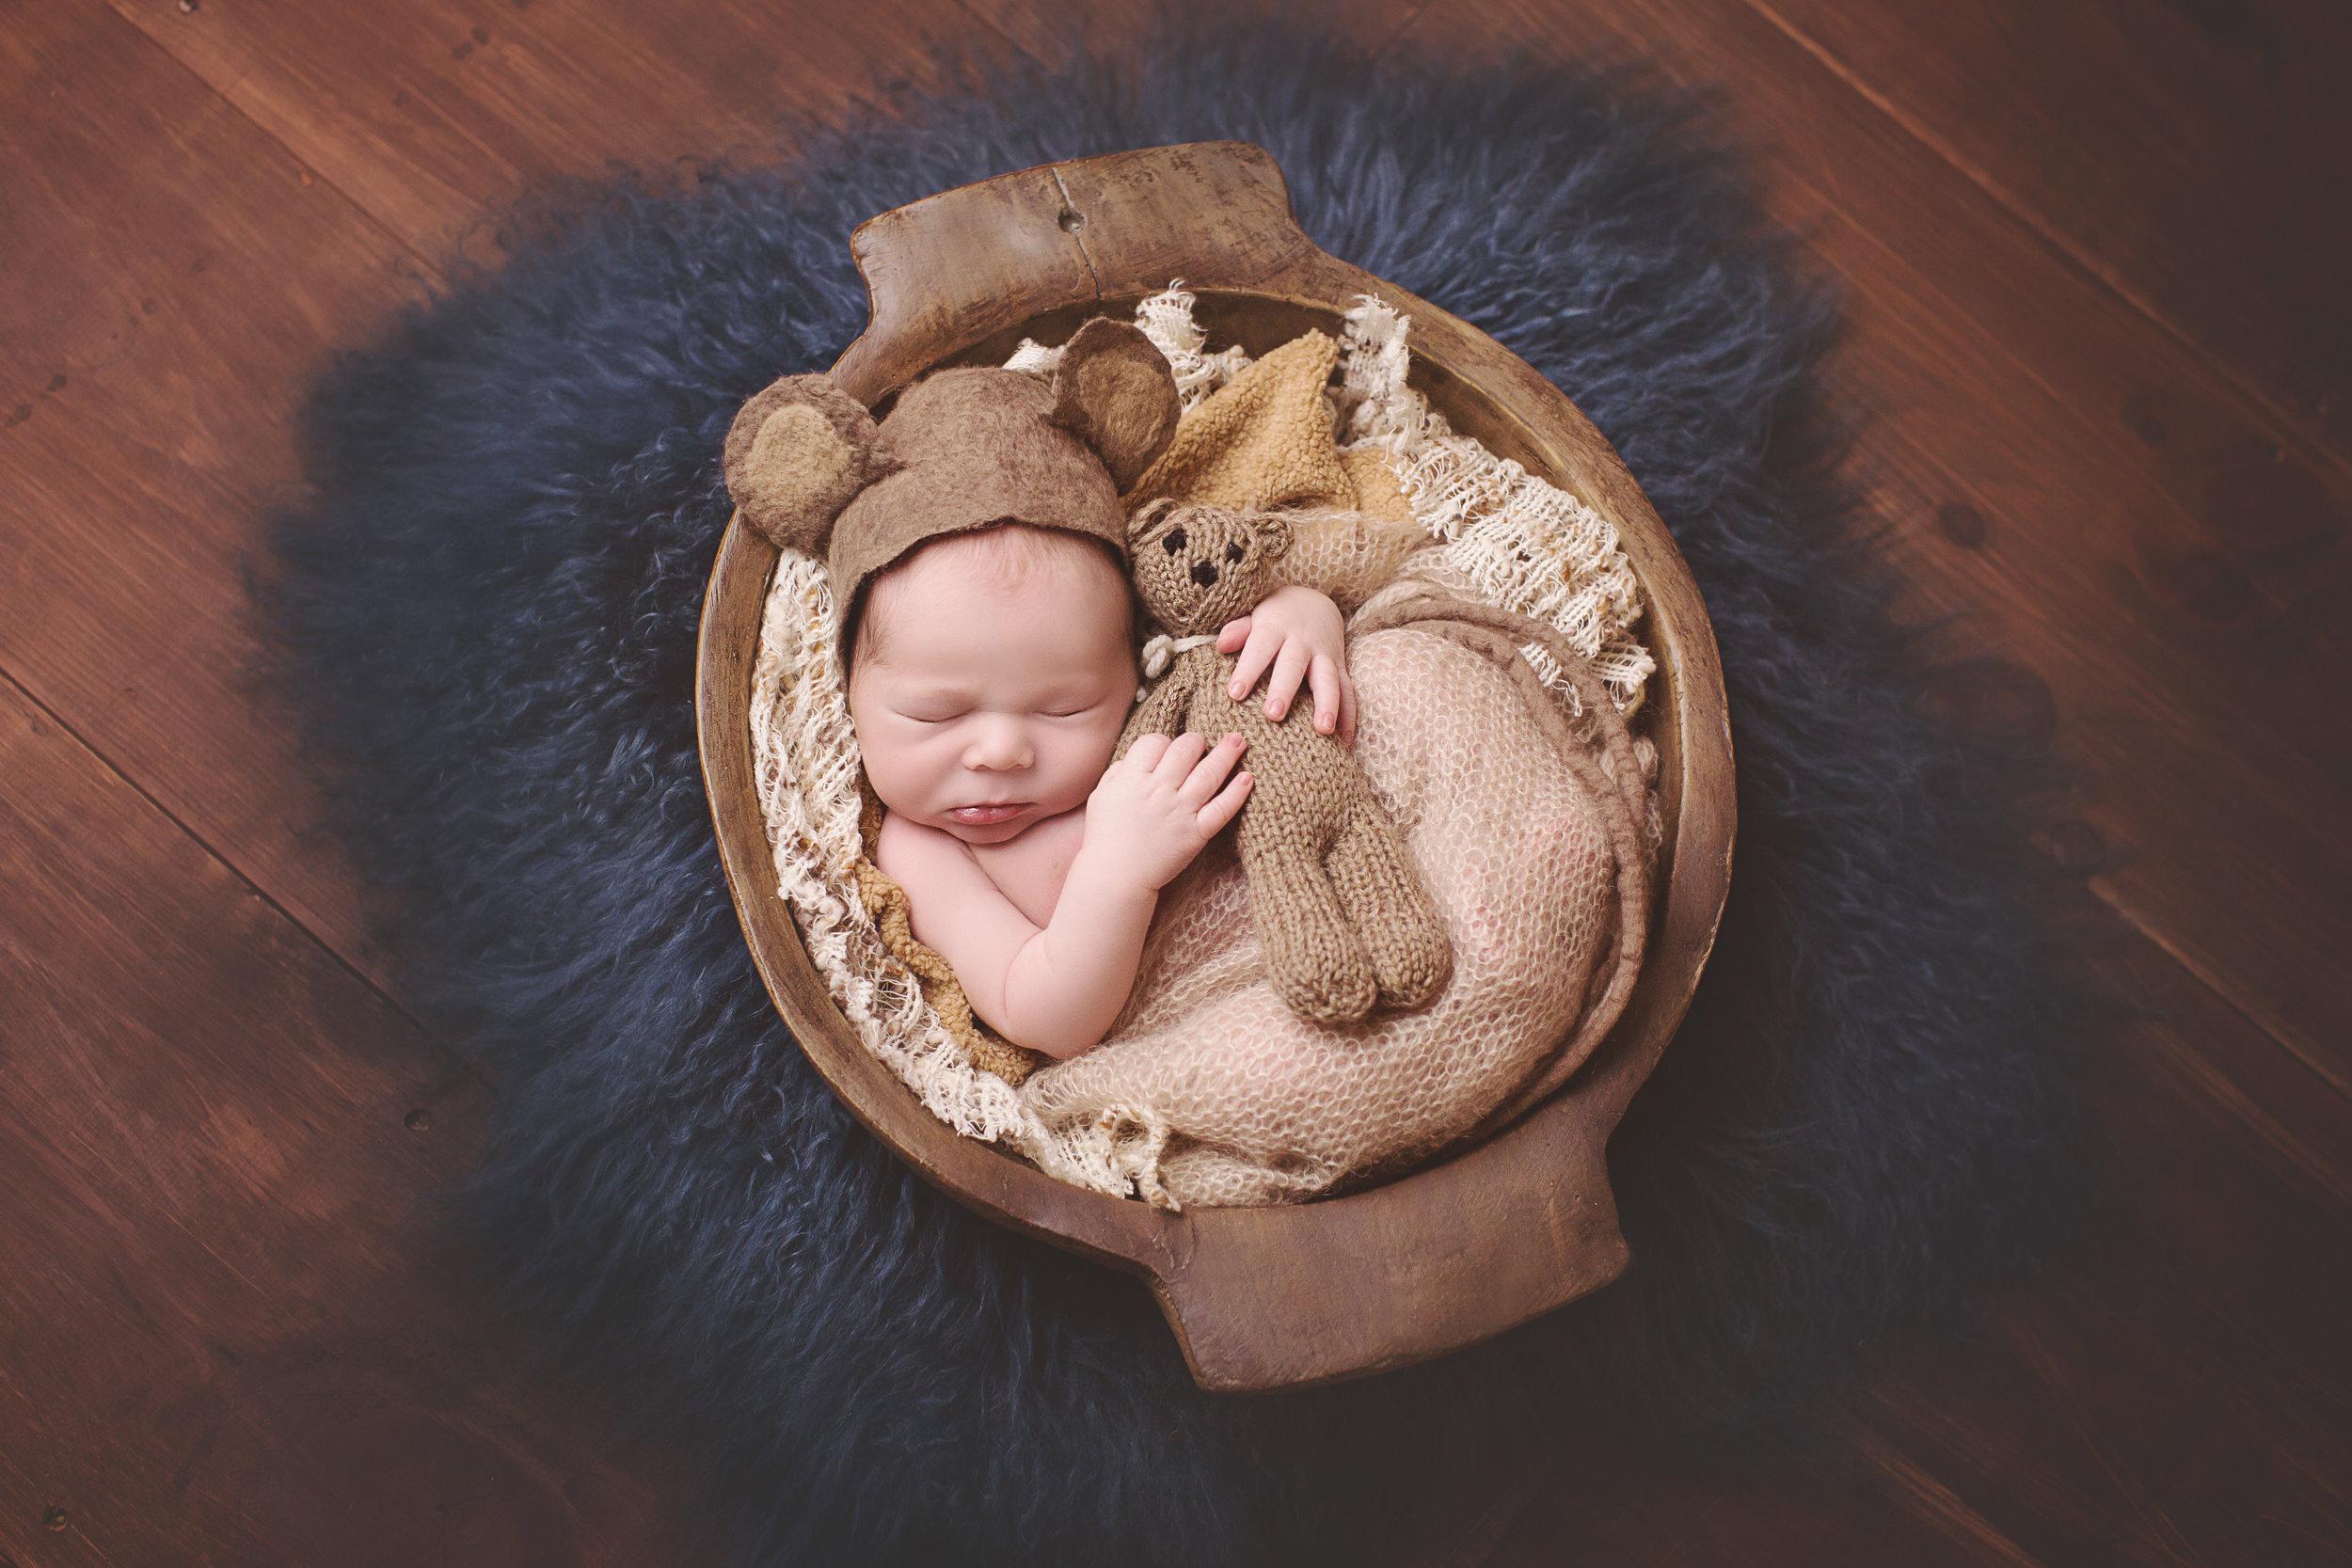 bianca-morello-photography-Archie-newborn-7.jpg